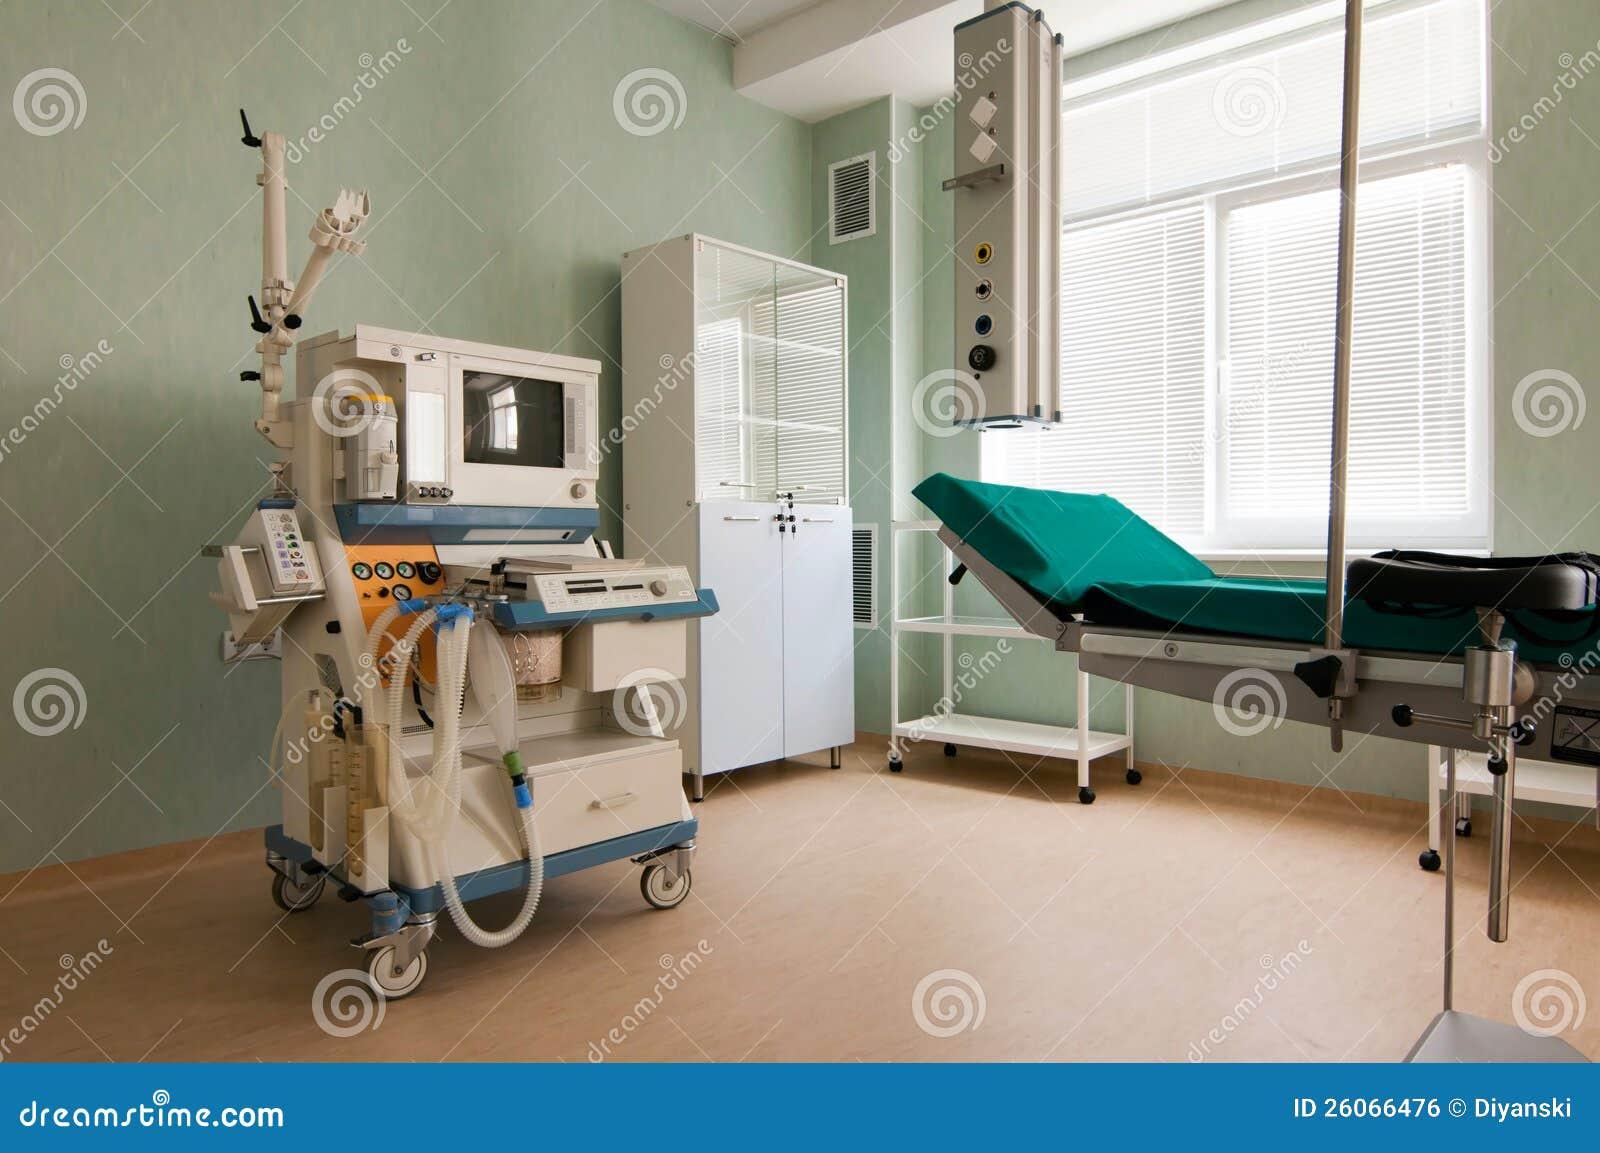 https://thumbs.dreamstime.com/z/medisch-kenmerkende-apparatuur-ruimte-26066476.jpg